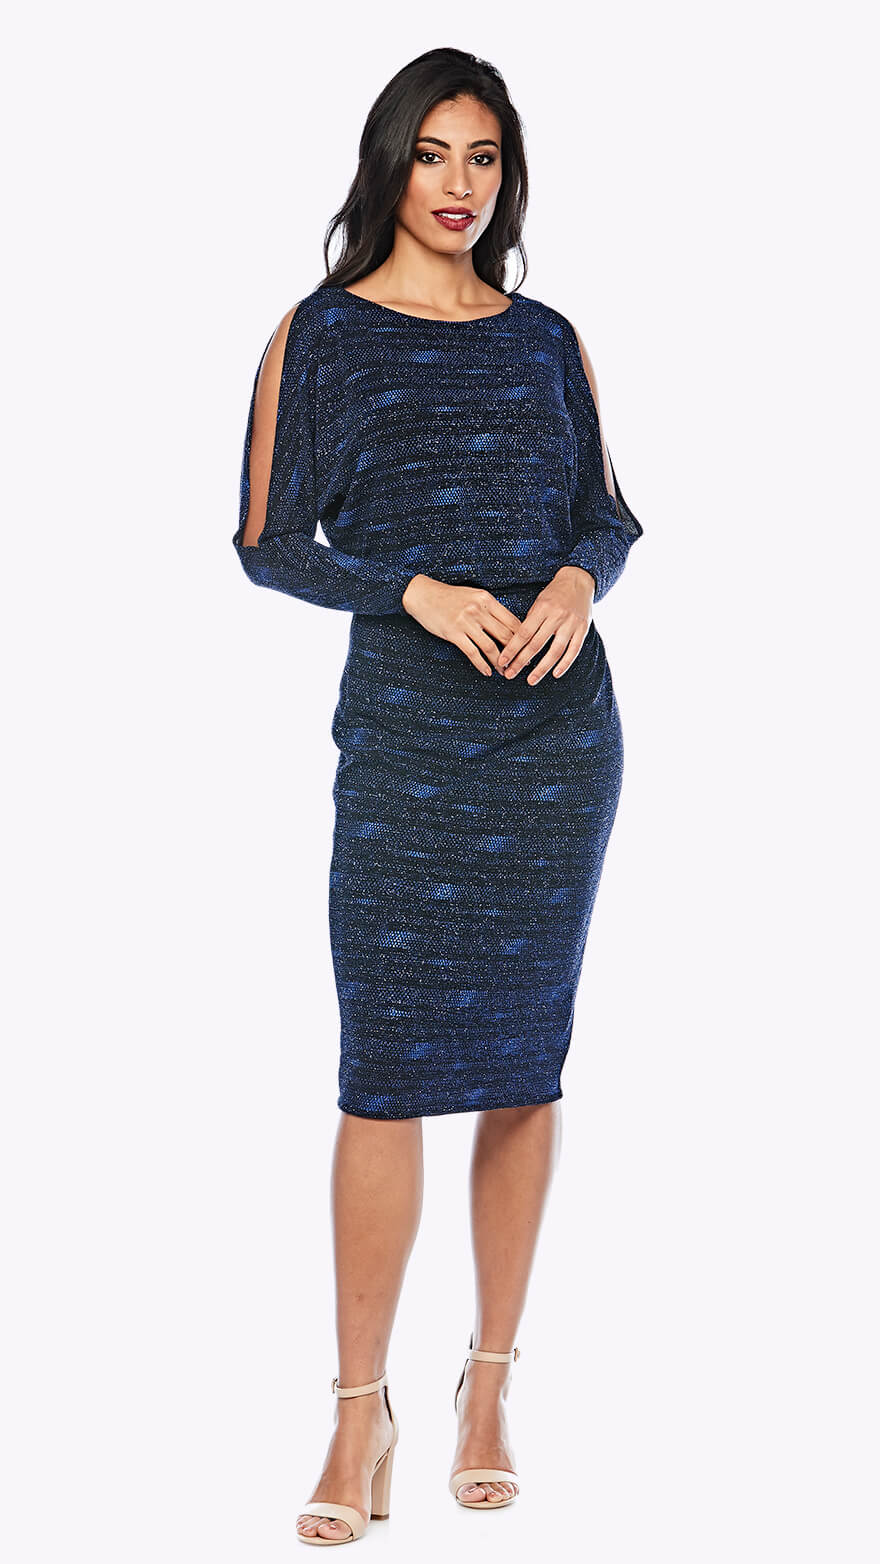 Z0190 Shimmer blouson style cocktail dress with open full-length sleeve